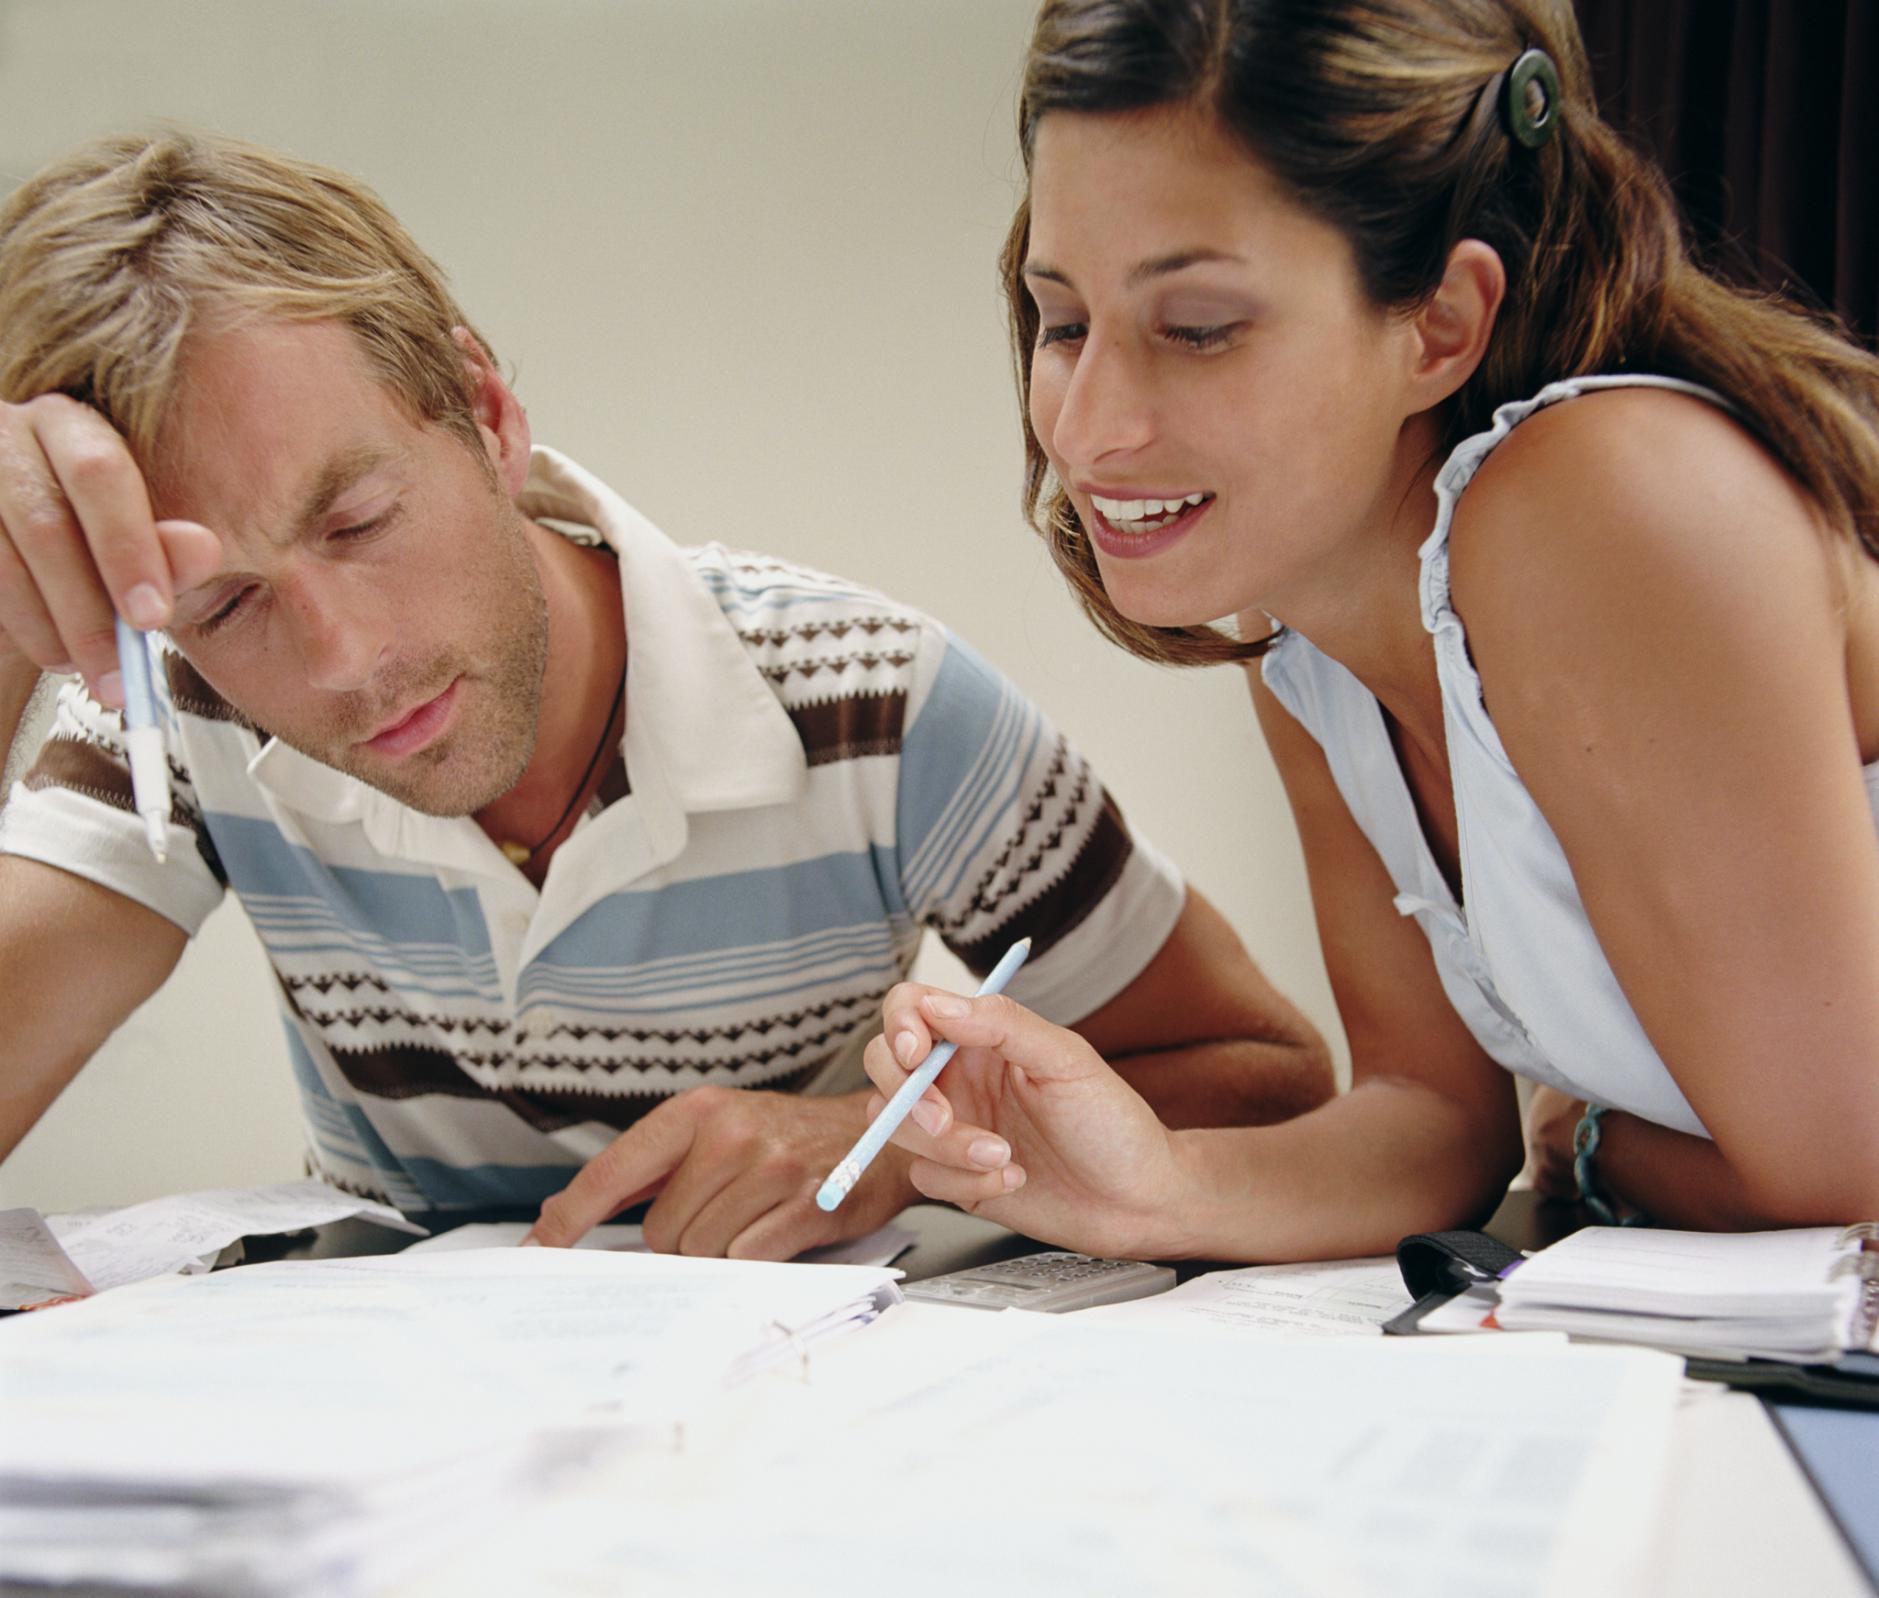 Parenting Plan Worksheets For Coparents